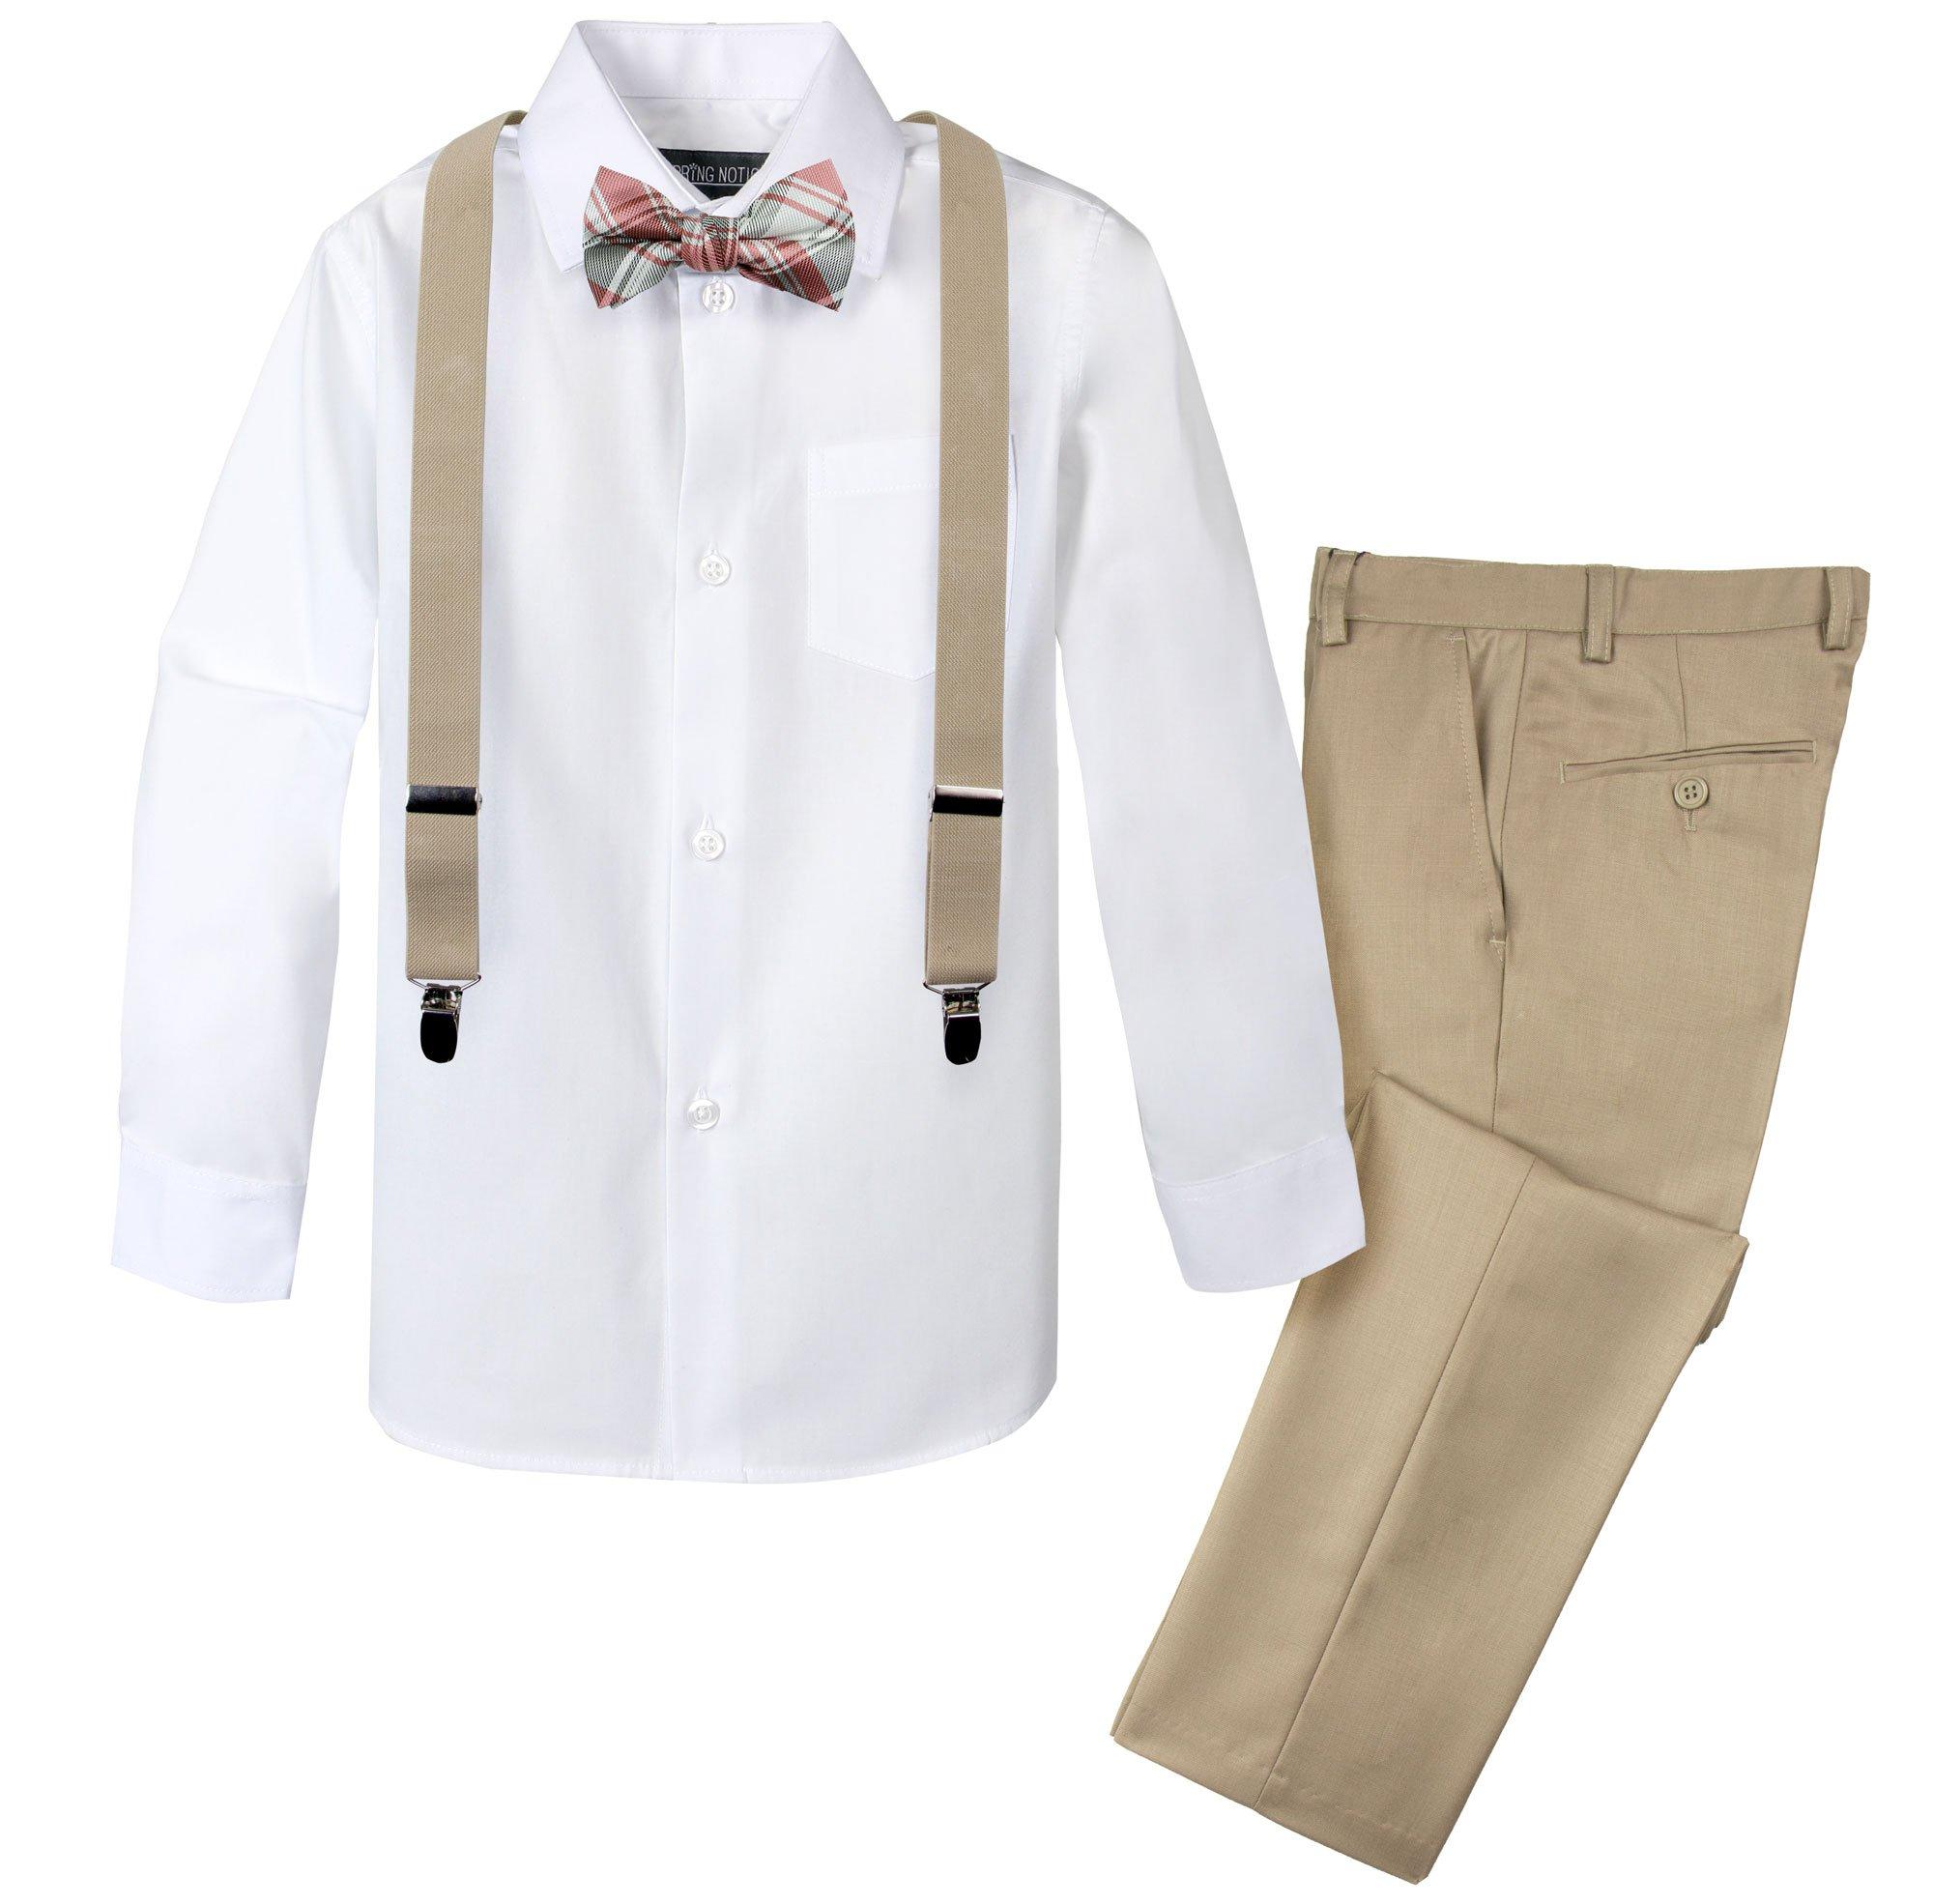 Spring Notion Boys' 4-Piece Patterned Dress up Pants Set 7 Tan/Champagne-Pink